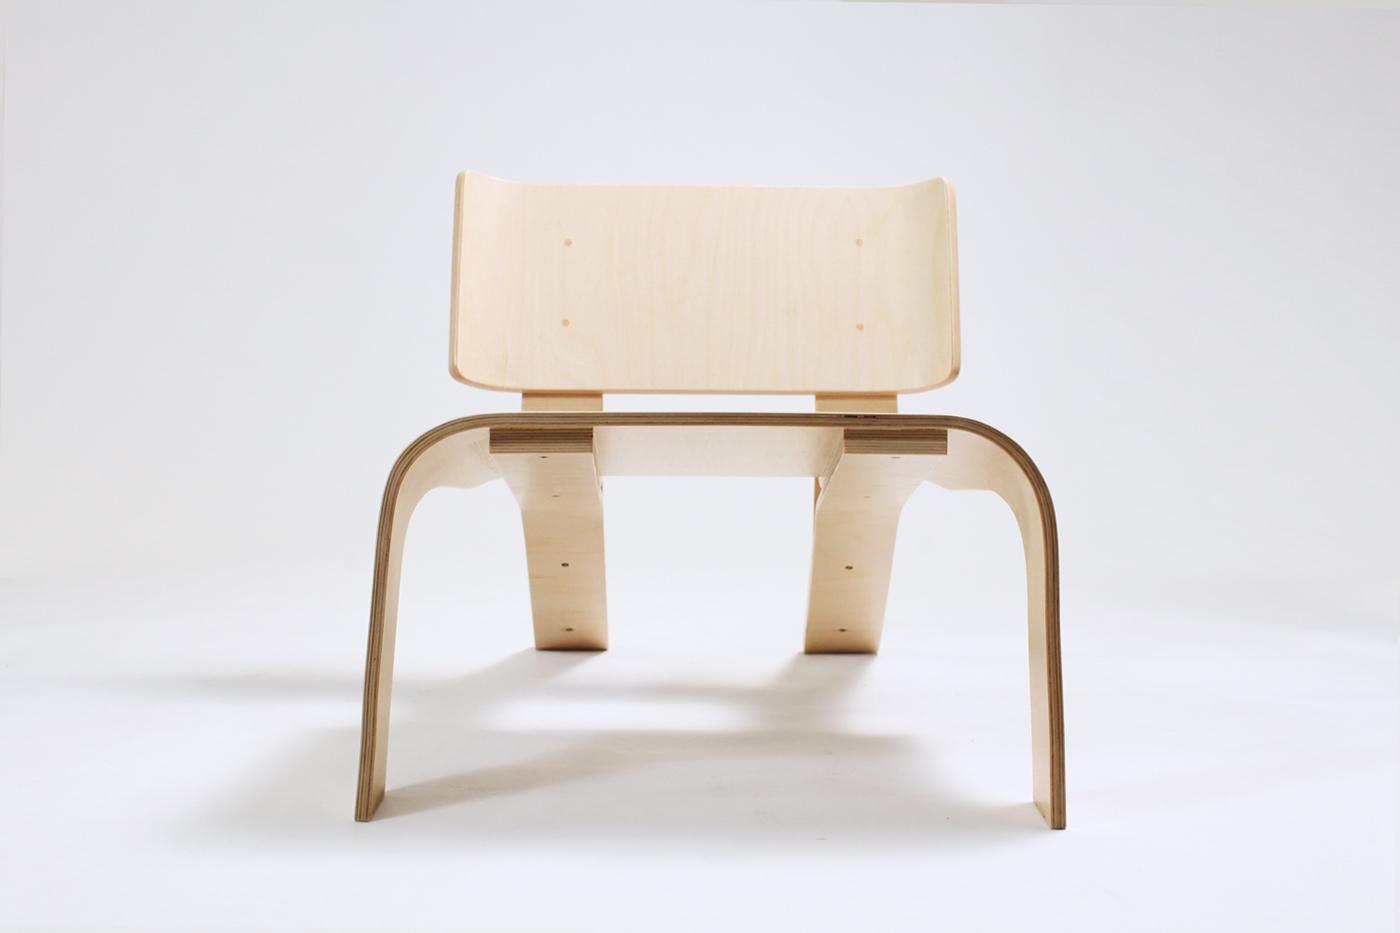 chair plywood bent wood molds lounge Georgia Tech Layup living room Baltic birch atlanta handmade